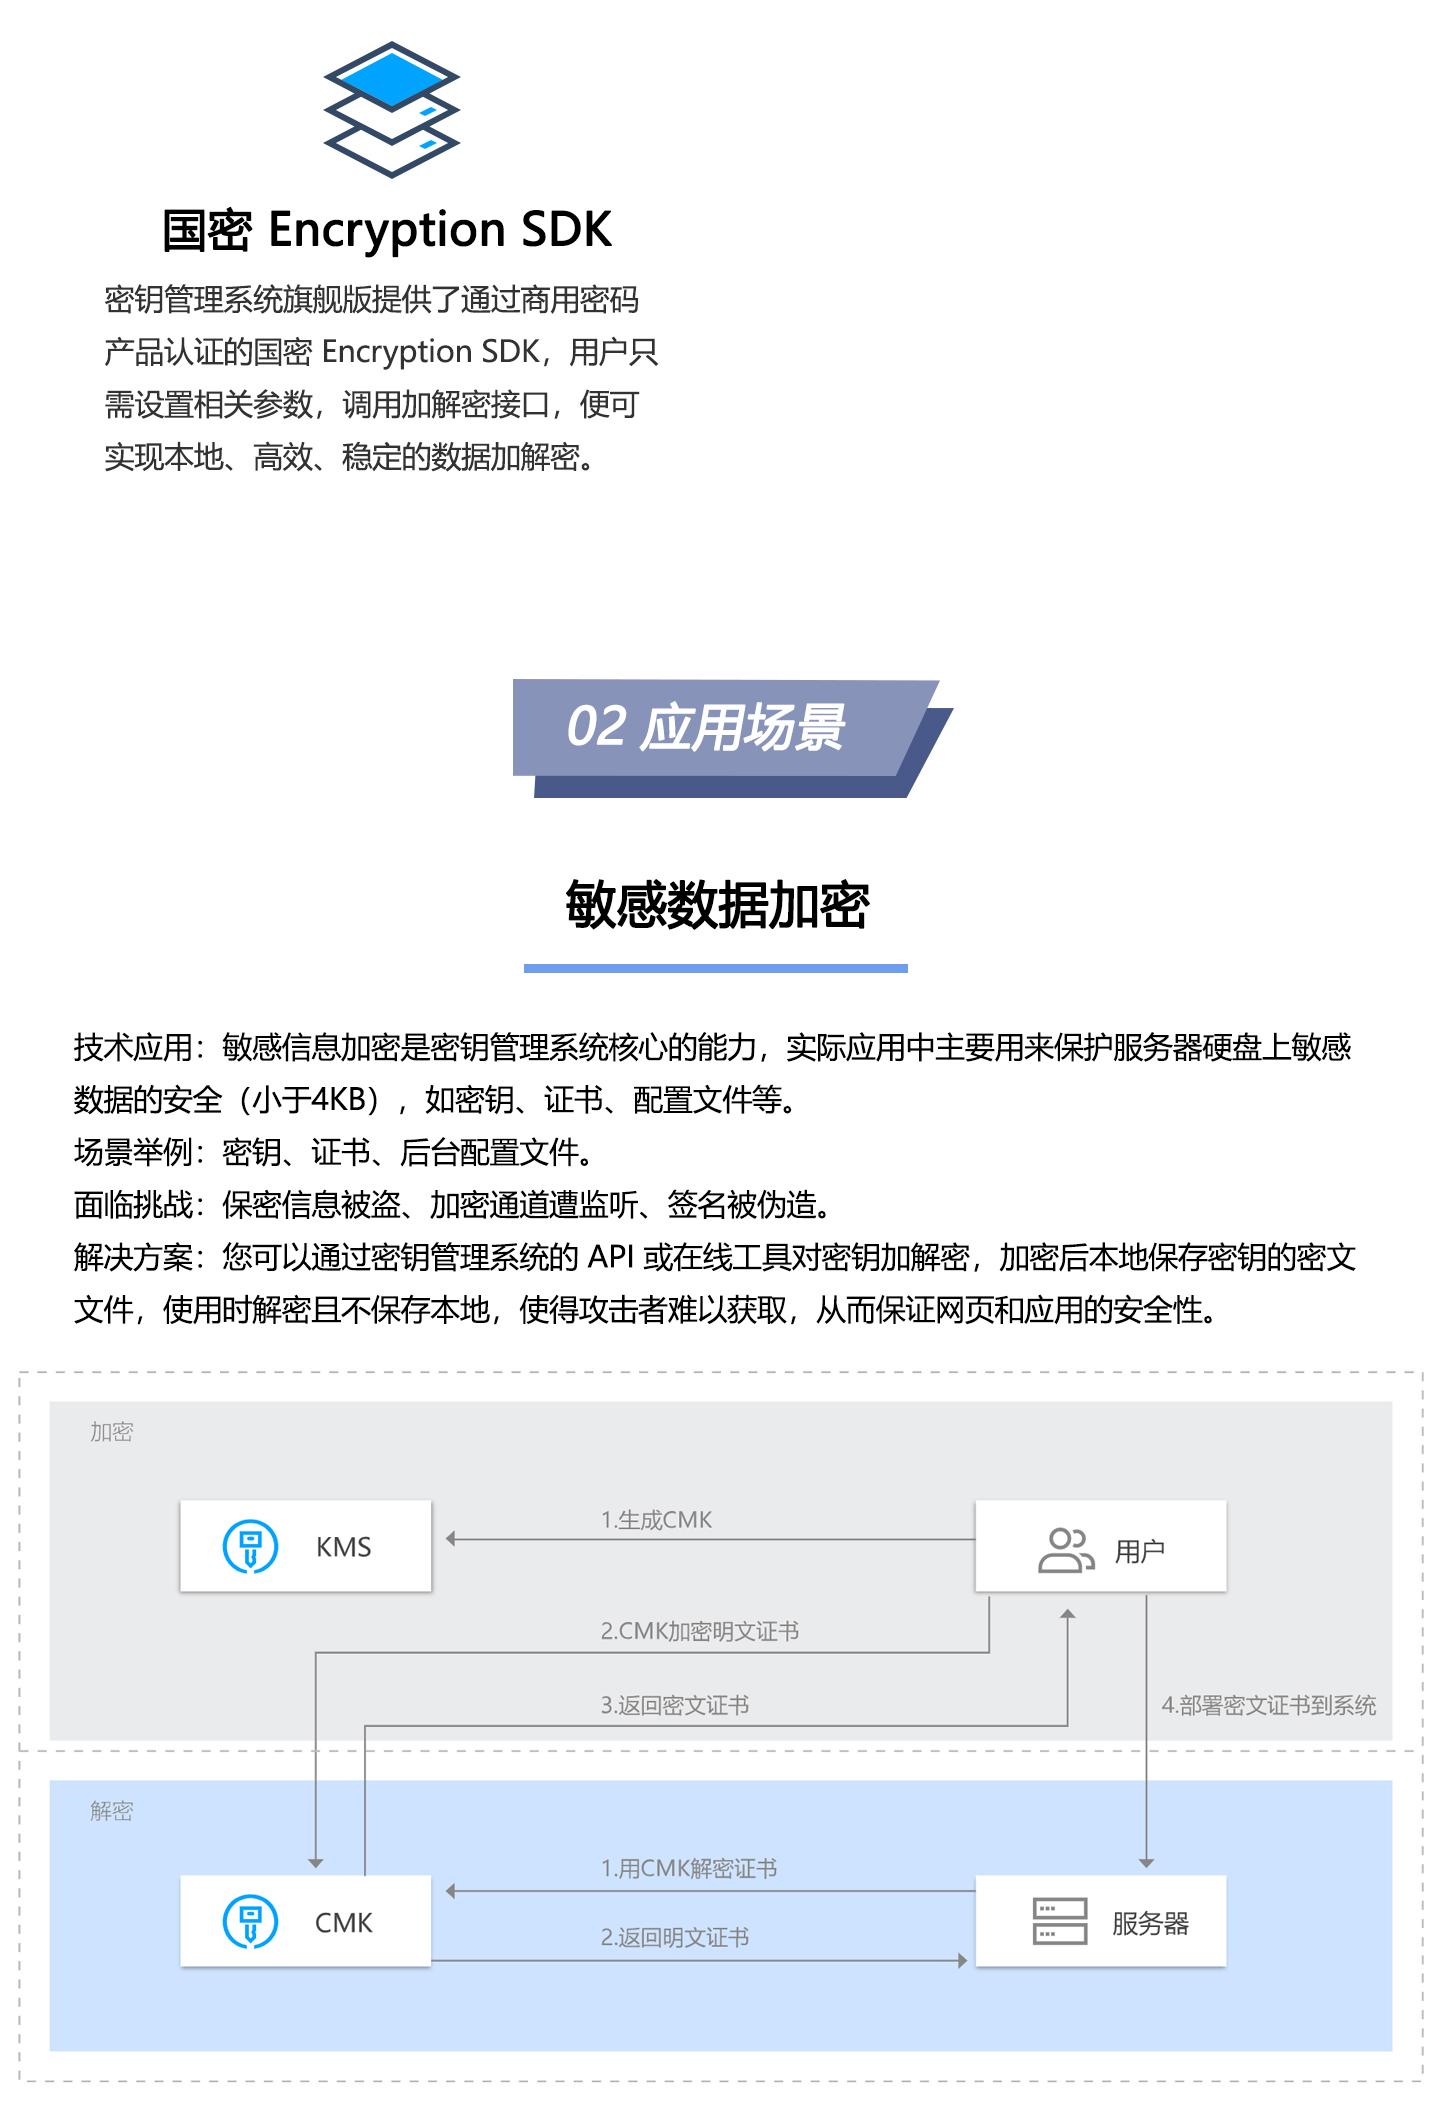 T-Sec-密钥管理系统1440_03.jpg